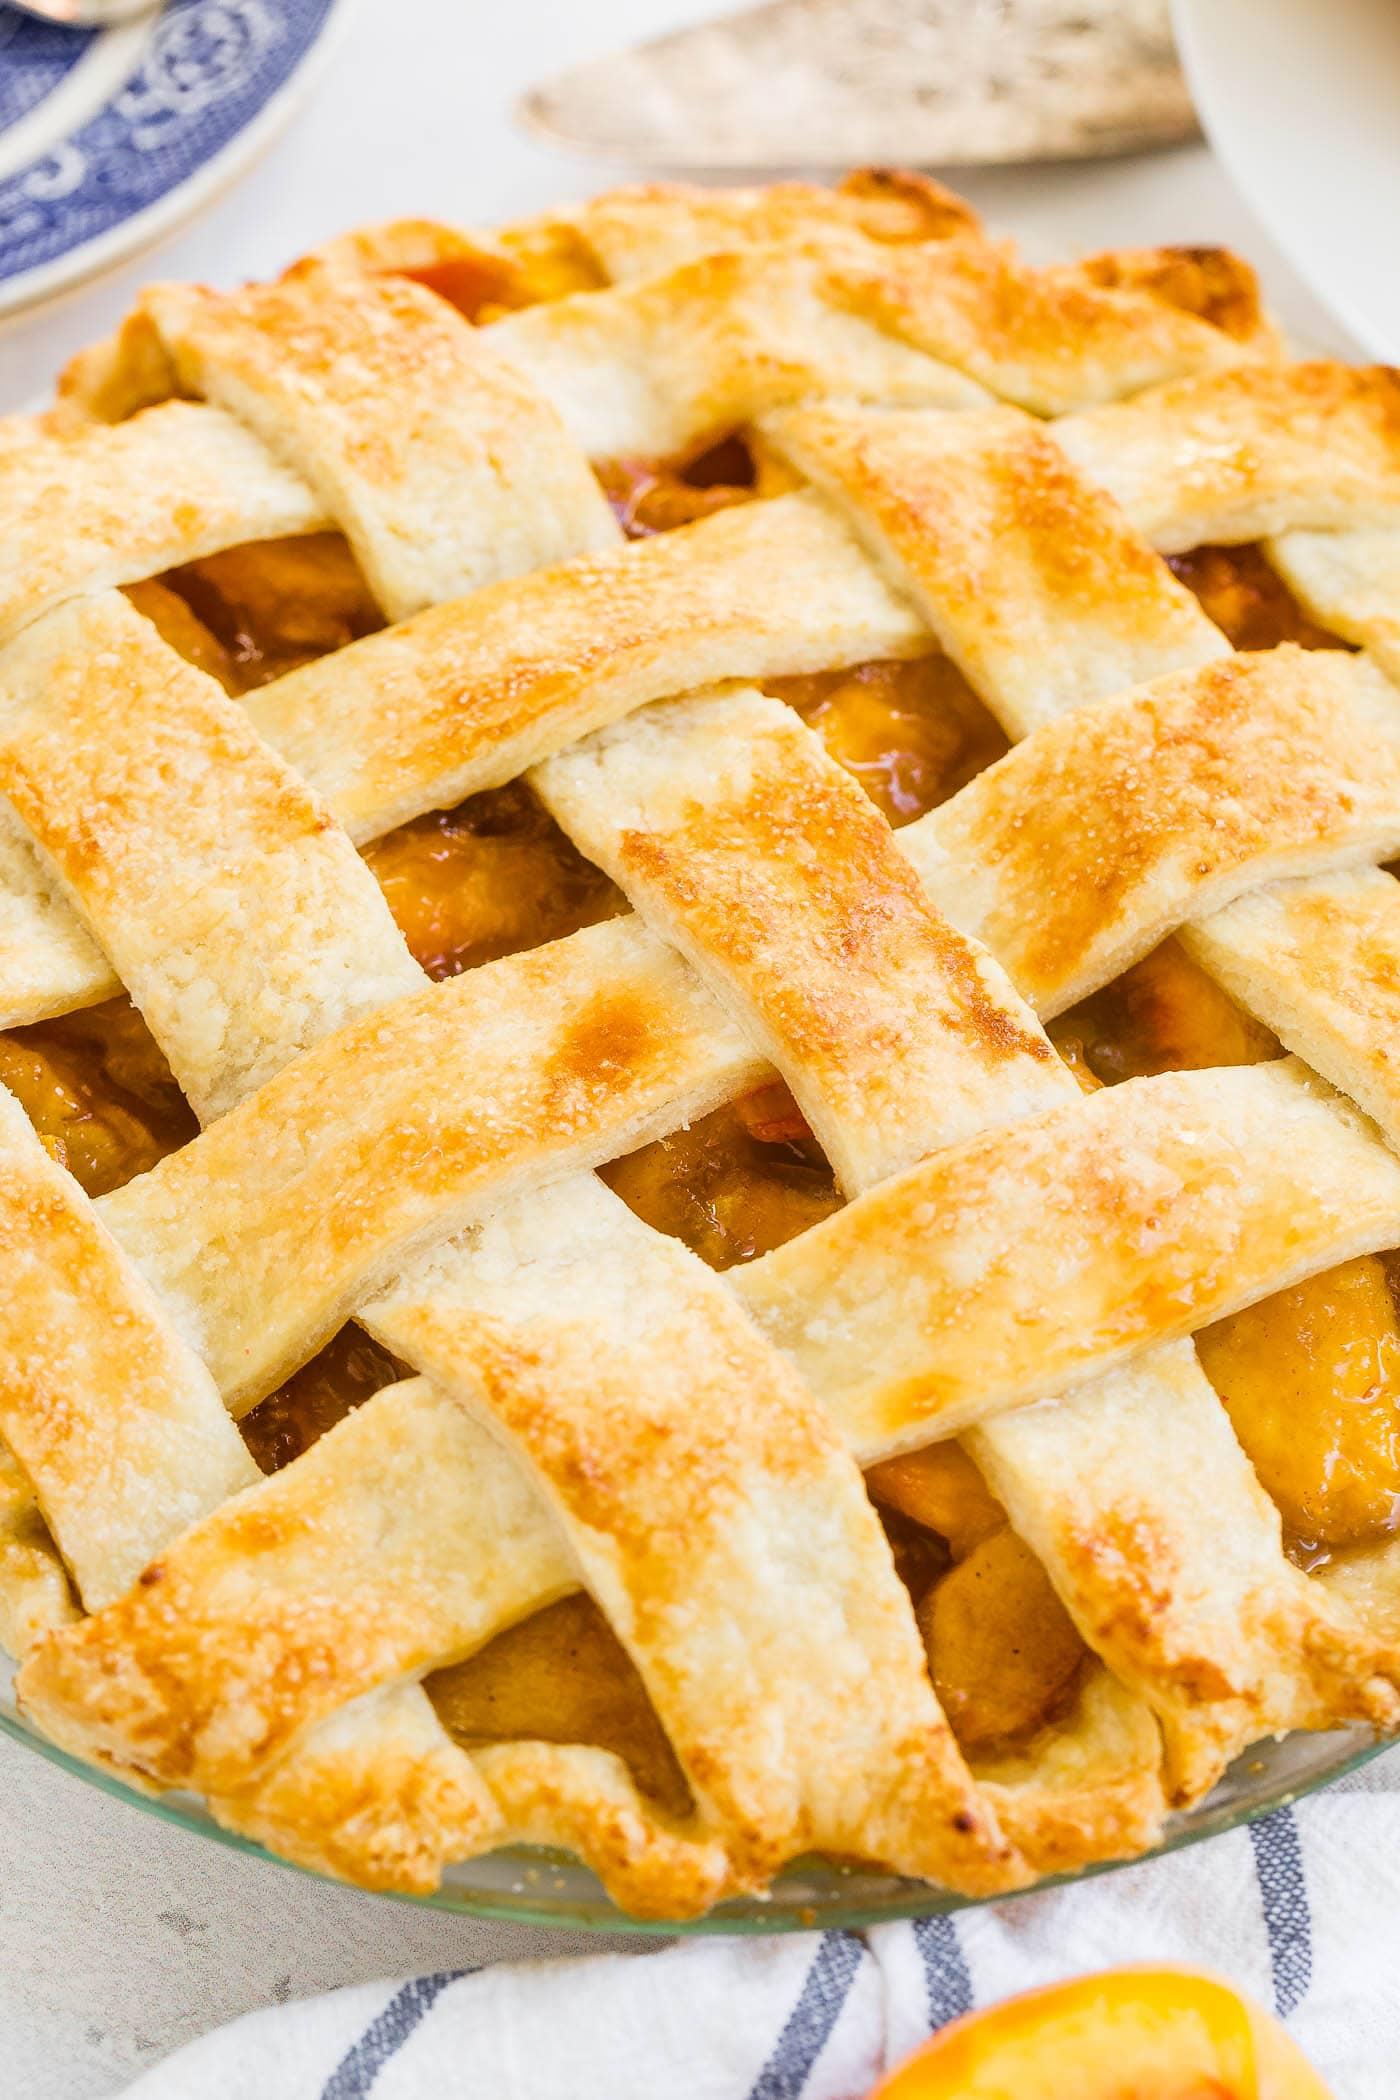 A photo of a fresh peach pie with lattice crust.